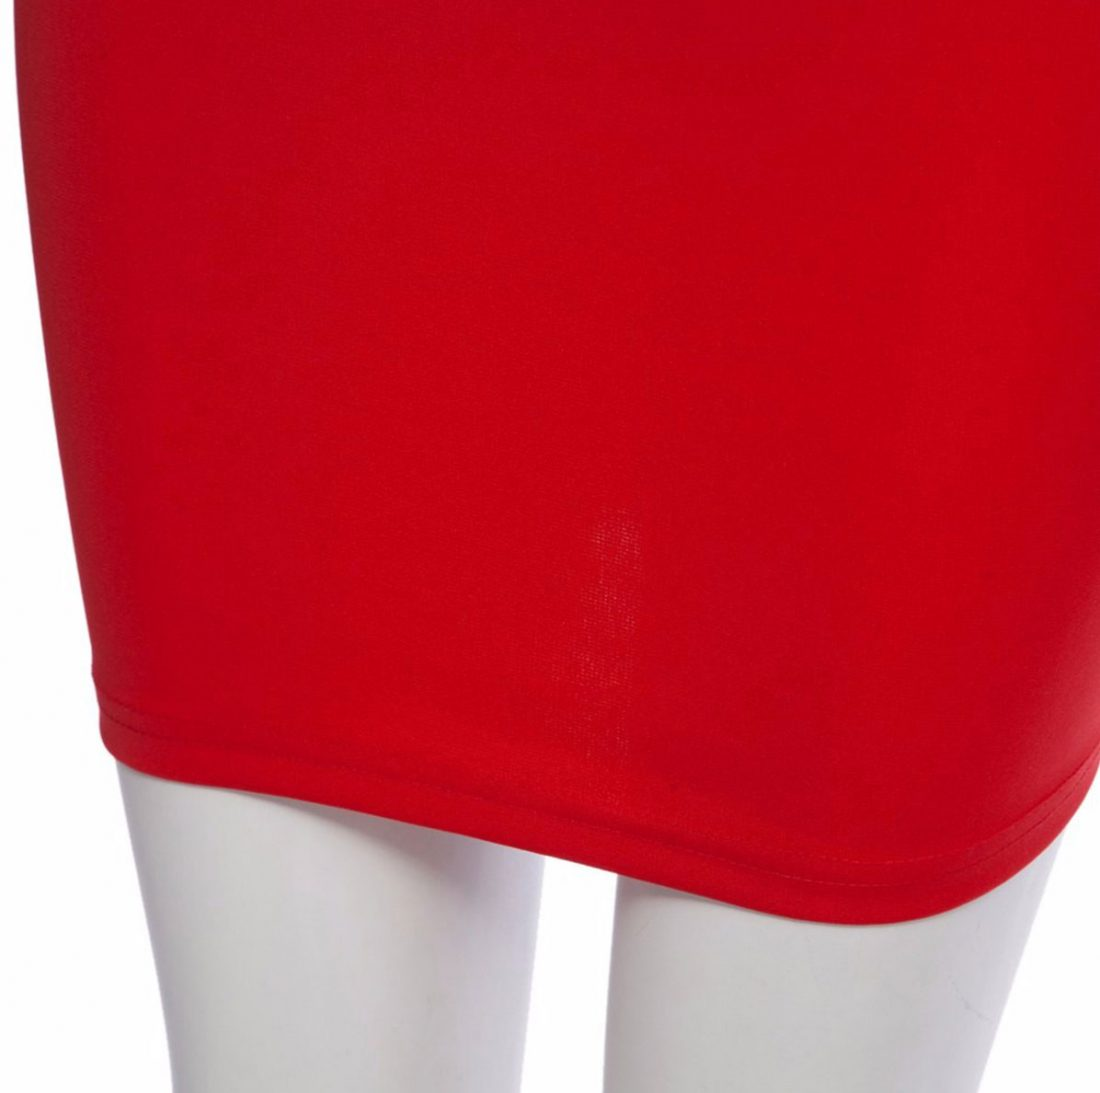 M0176 red4 Party Dresses maureens.com boutique